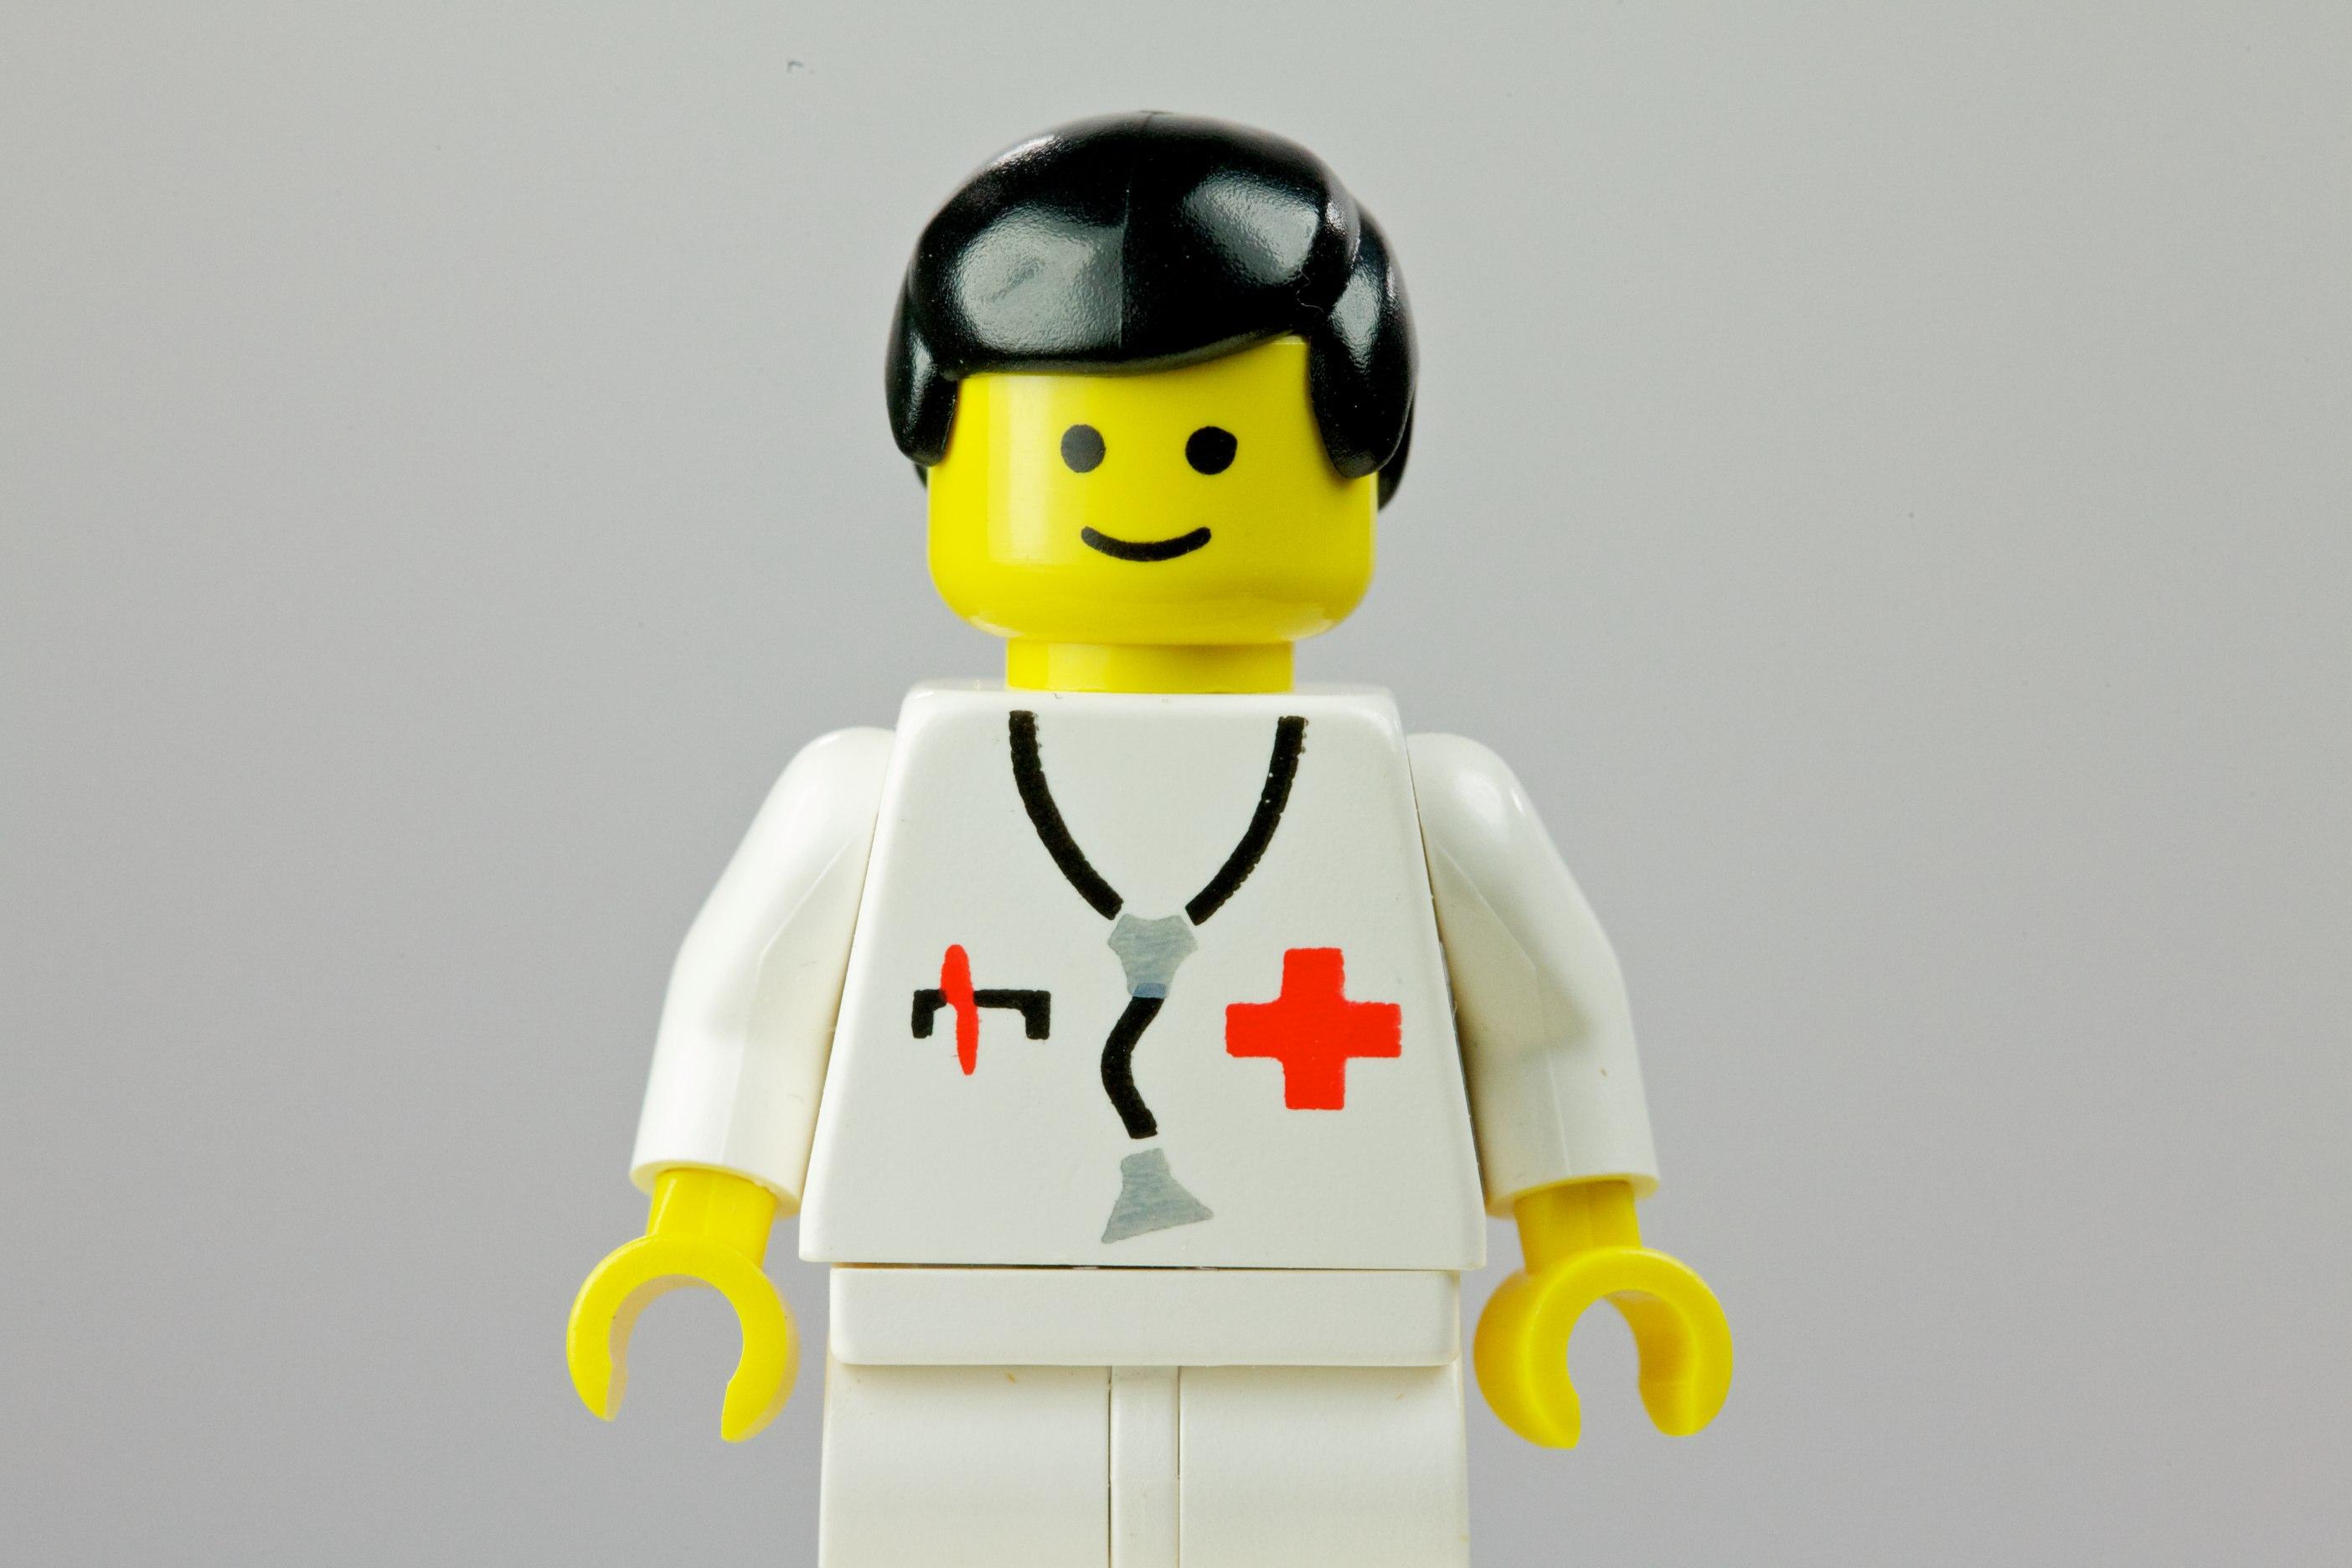 PHOTO COURTESY FLICKR.COM Jeff Eaton | Trust me, I'm imitating a doctor.